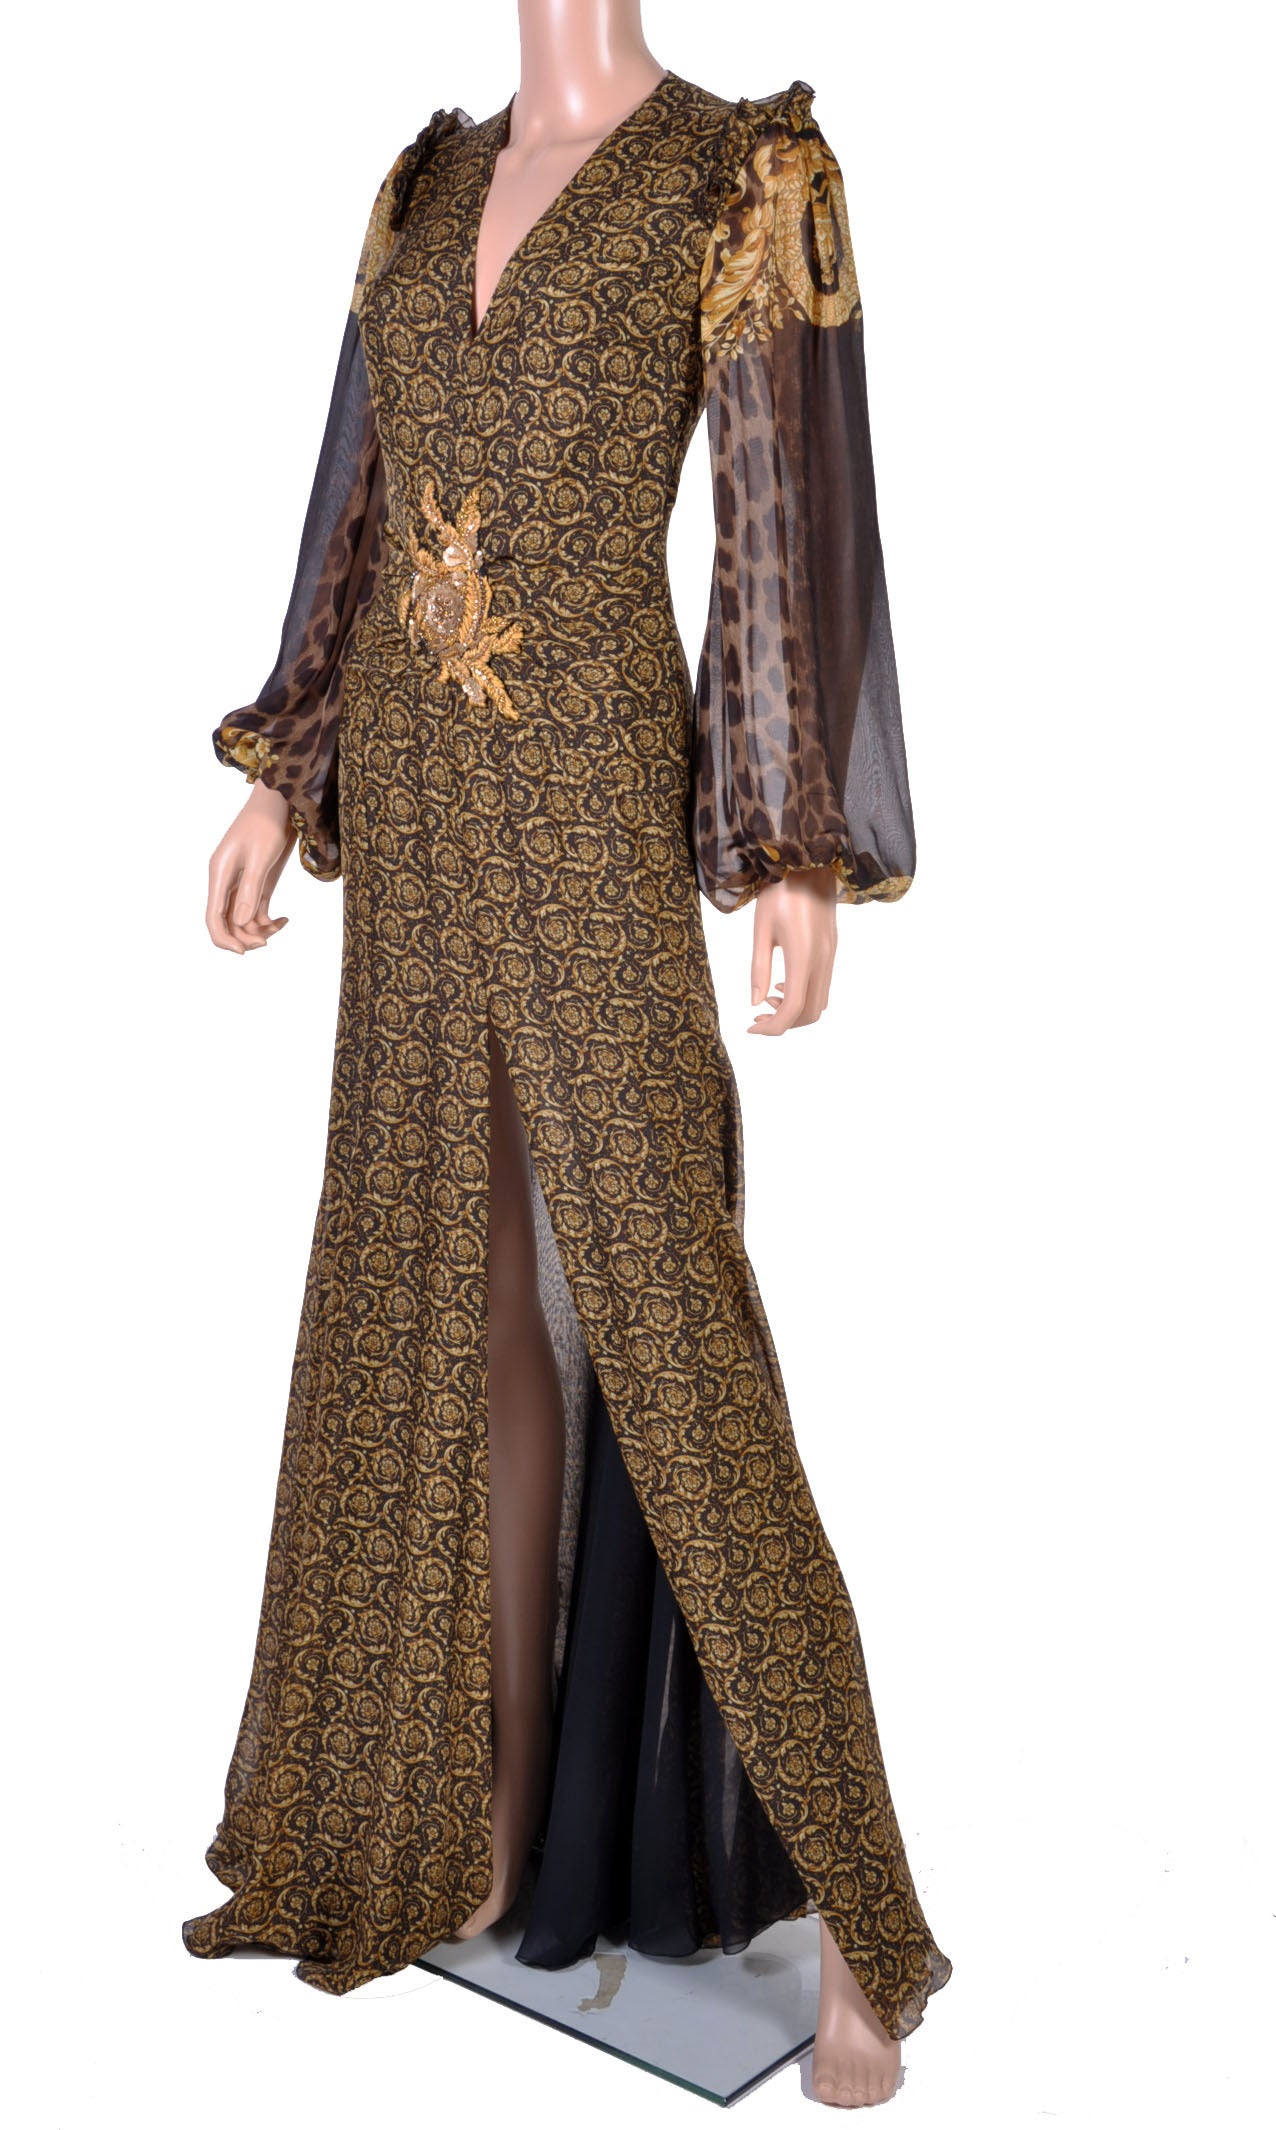 New Versace Mixed Print Silk Gown 2